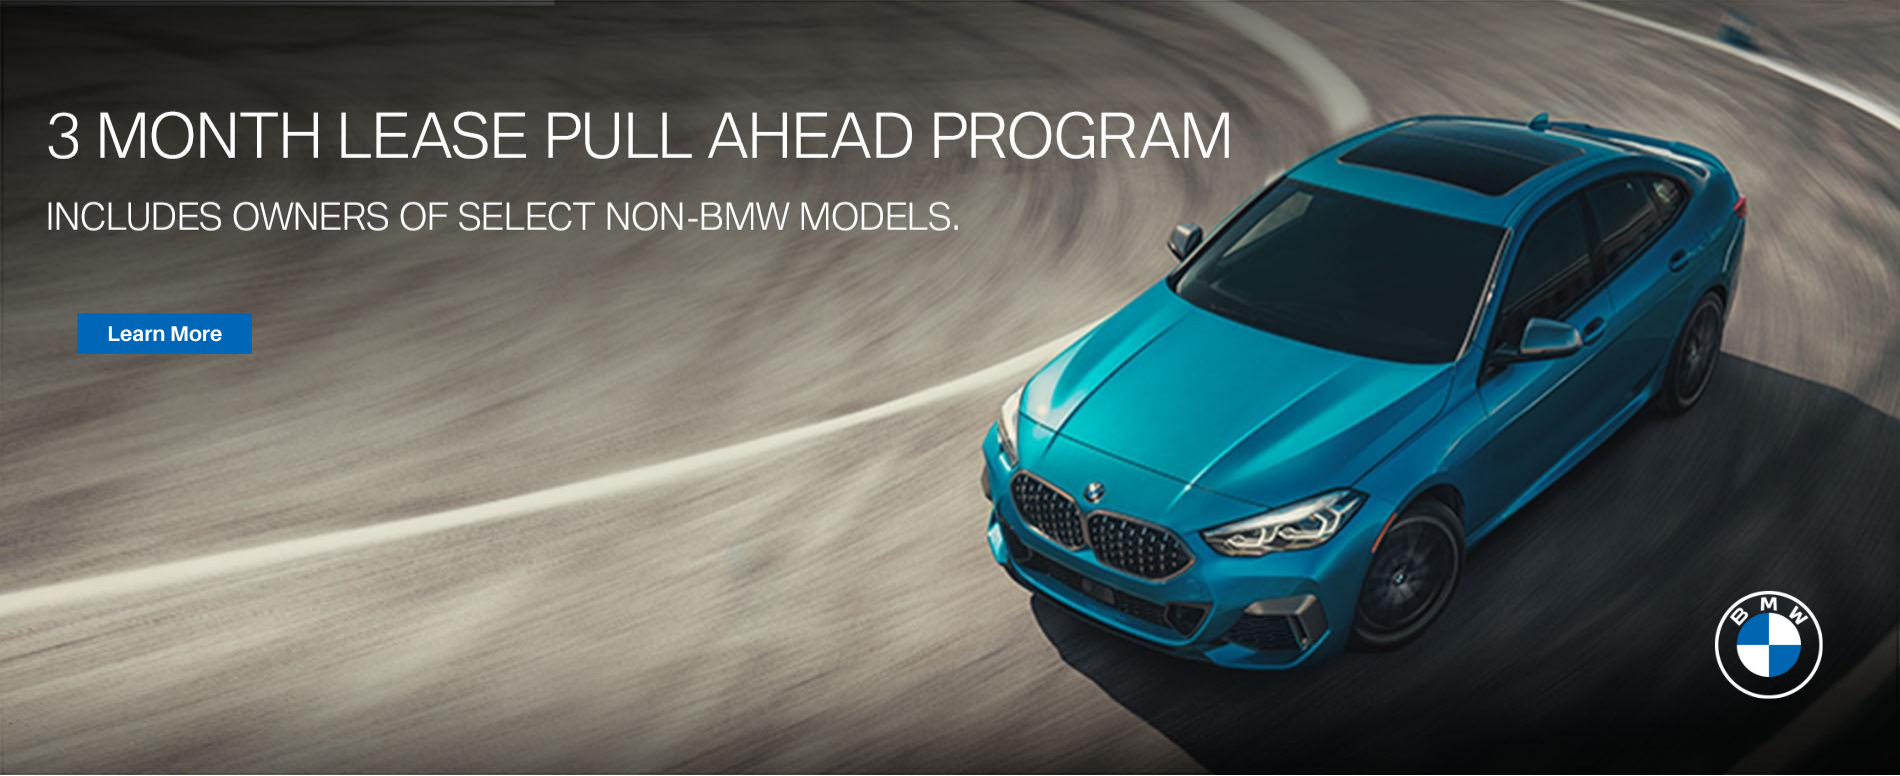 Circle BMW pull ahead program